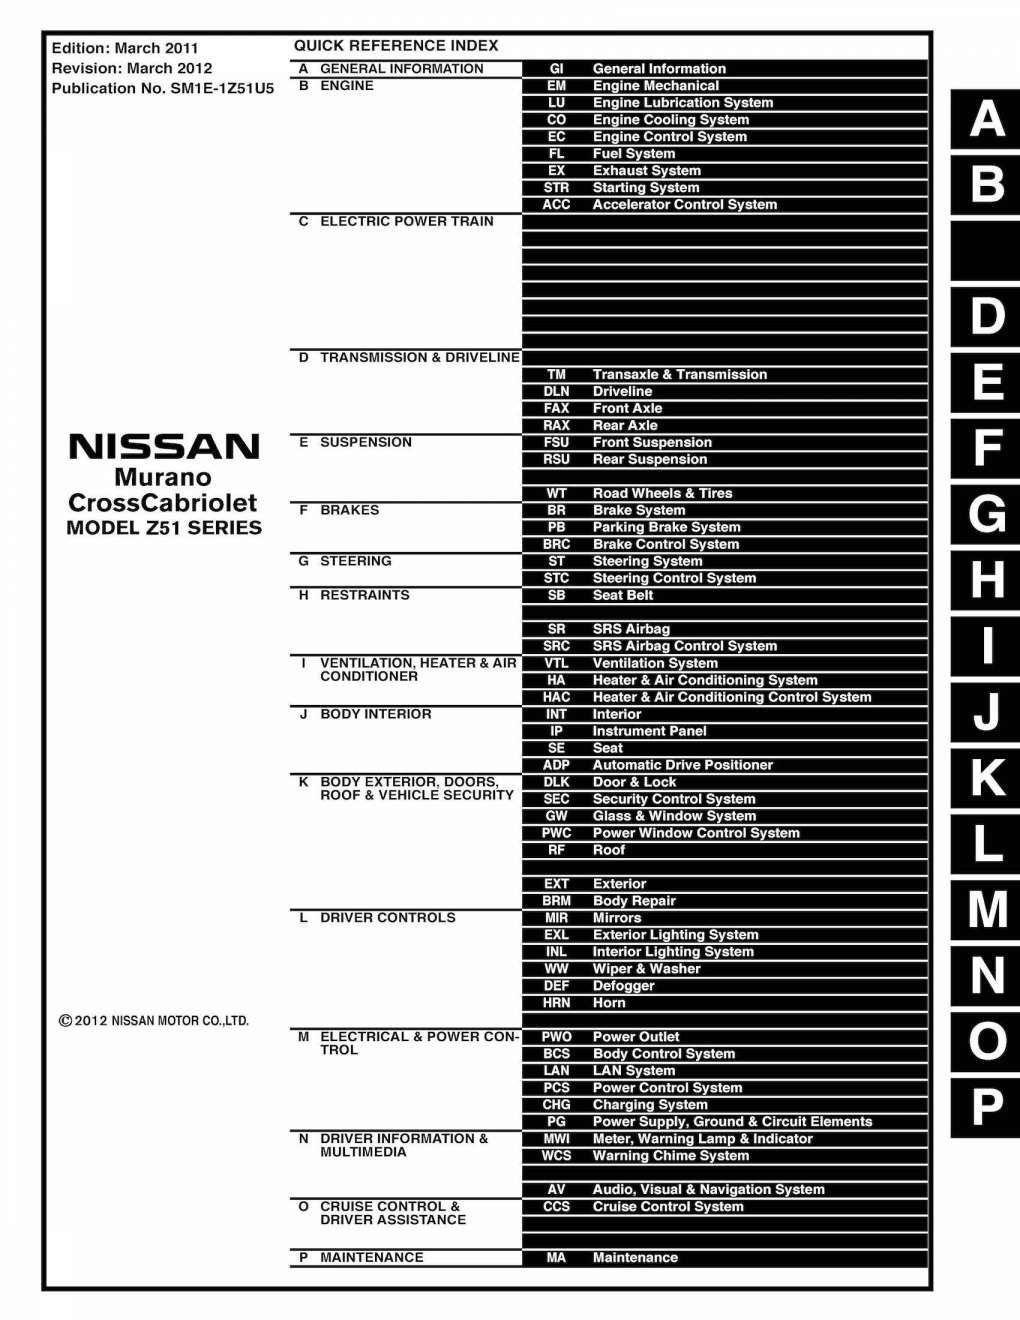 Nissan Murano Engine Wiring Diagram And - Nissan Murano-z Z  U0026 Crosscabriolet  Oem